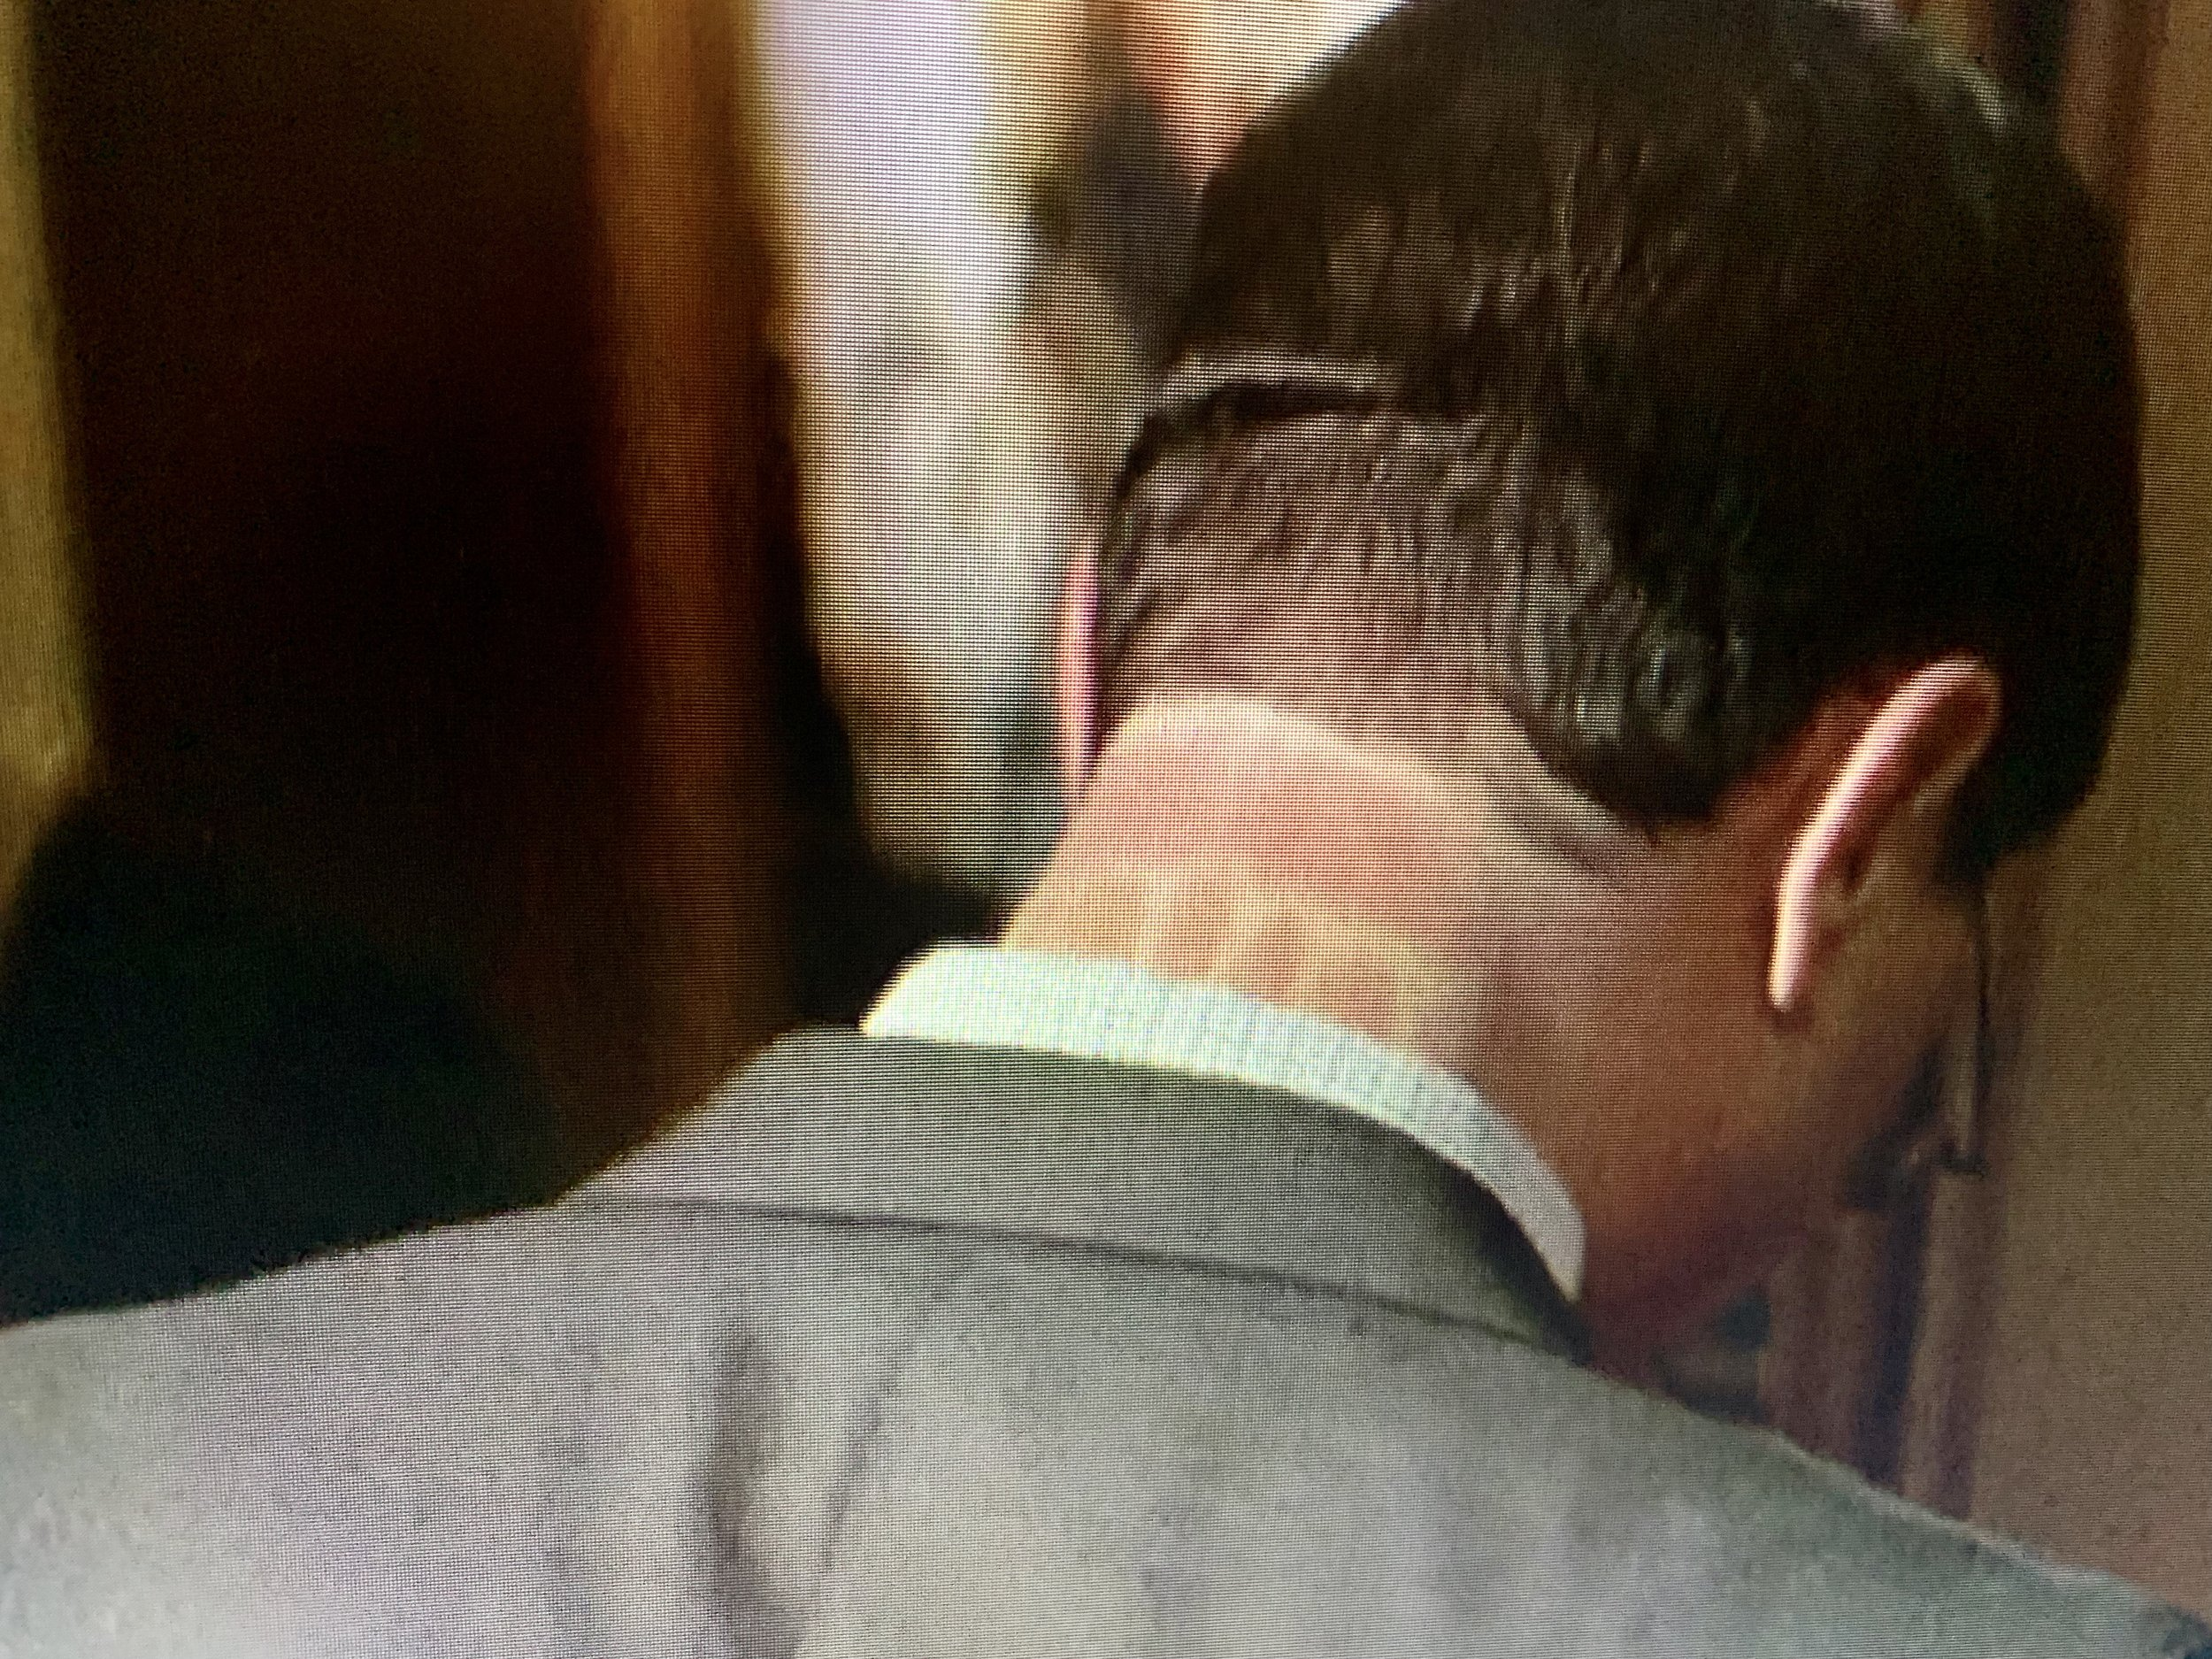 Josh's inexplicable neck markings